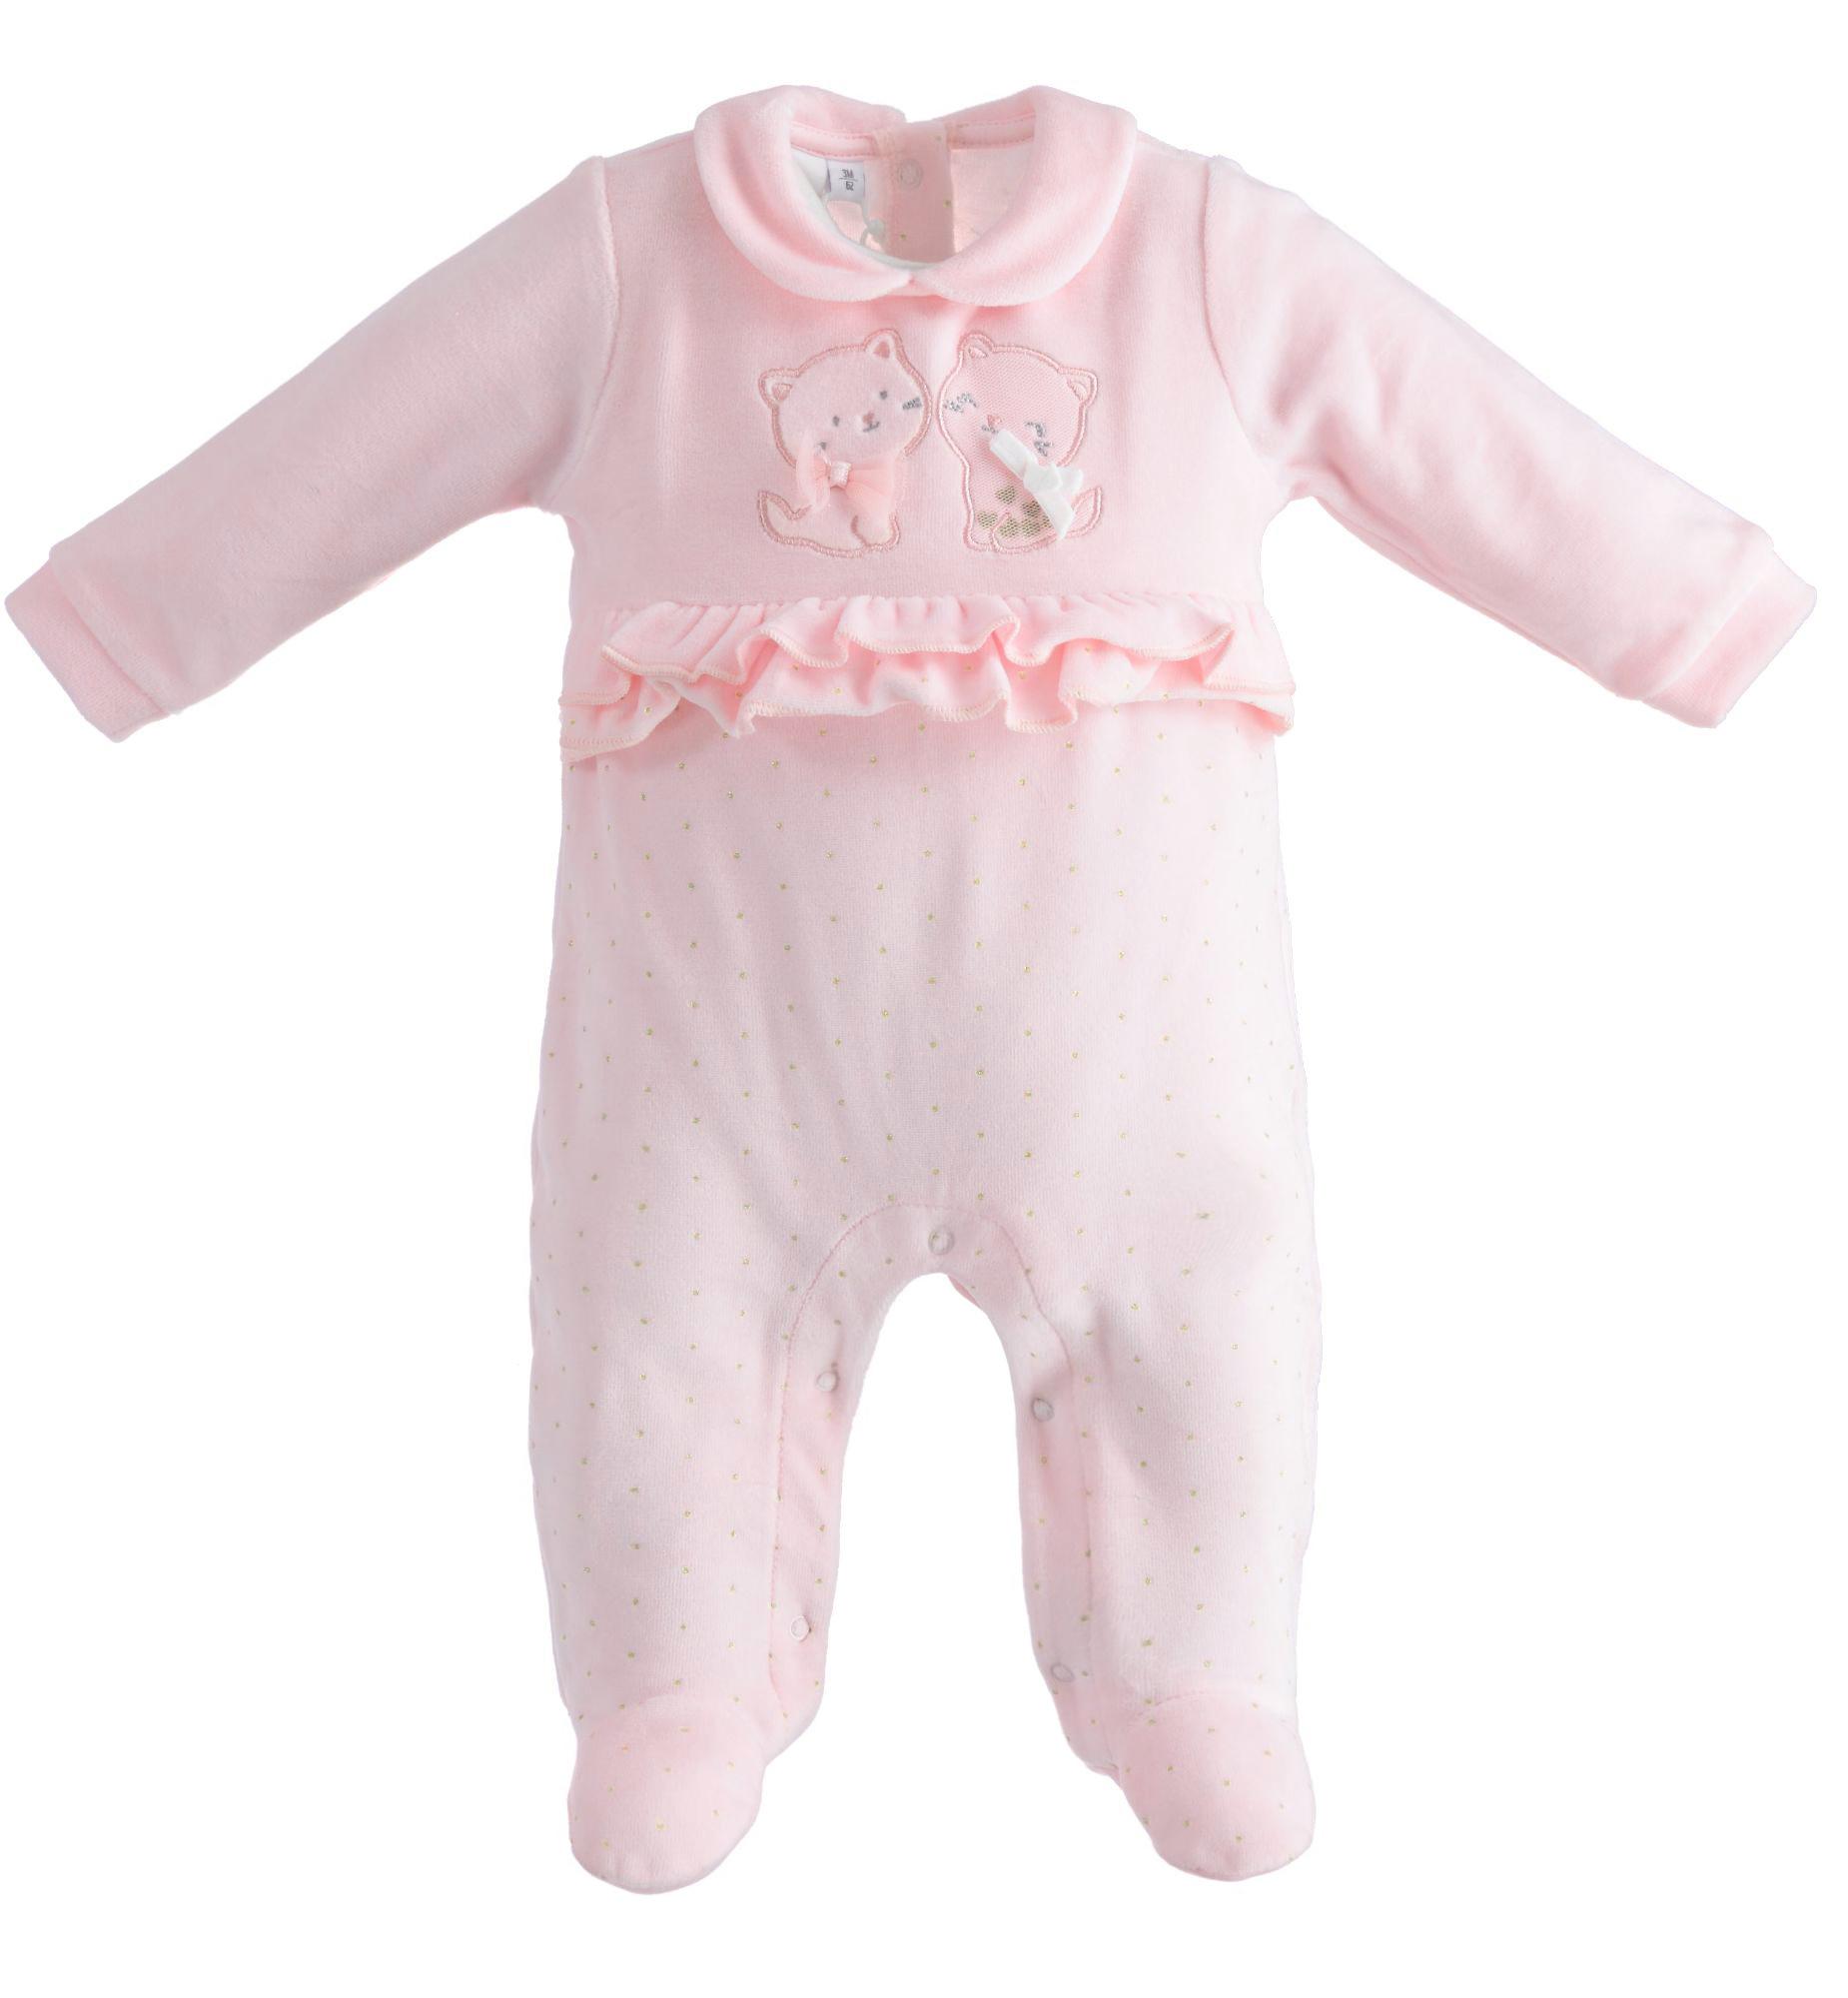 Ido iDO Pink Velour Frill Babygrow - 43260 AW21